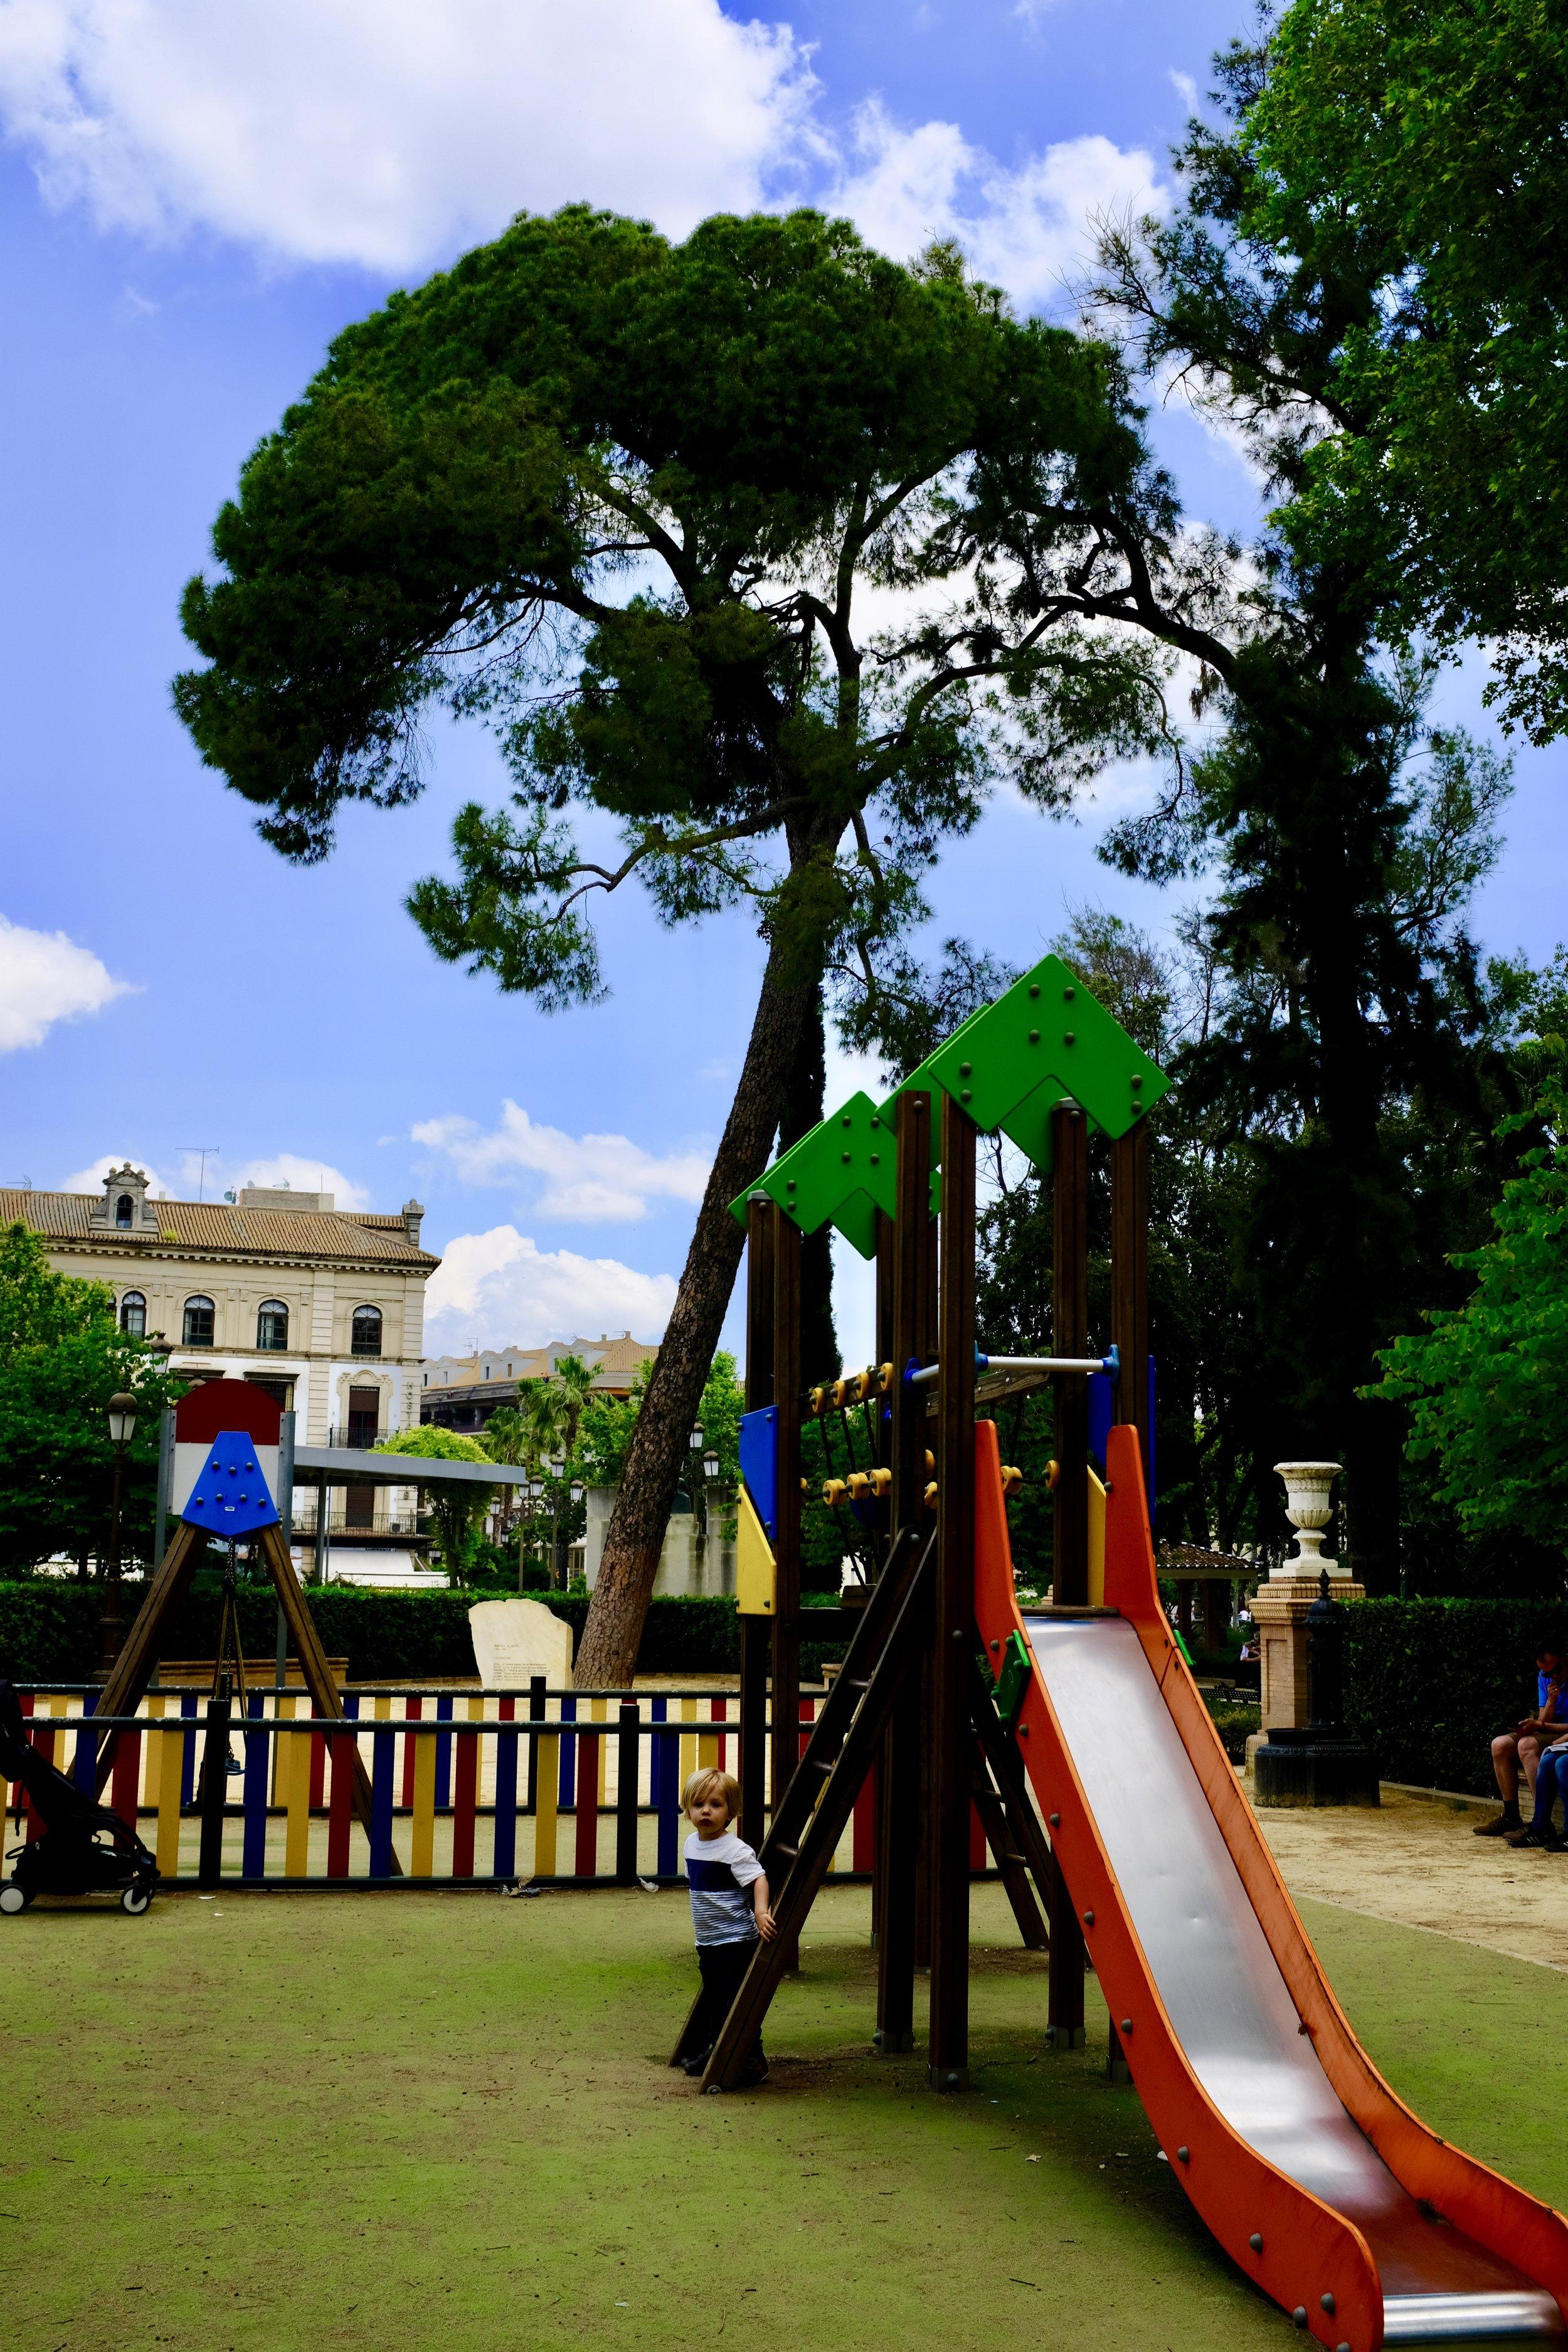 Puerta de Jerez Playground_City Nibbler_Seville